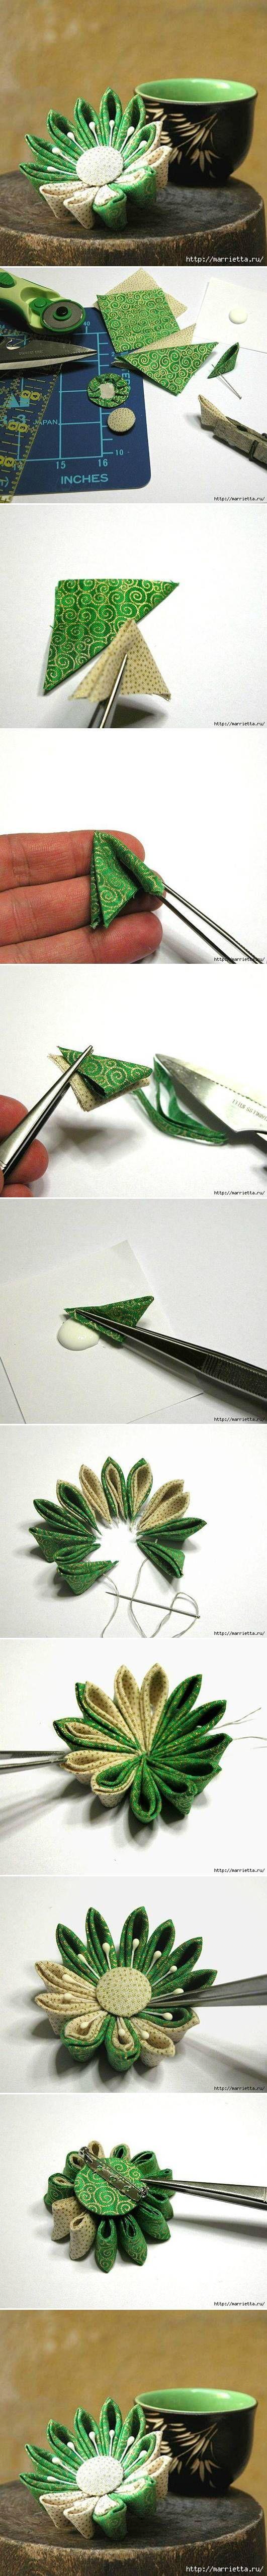 DIY Japanese Kanzashi Flower DIY Projects | UsefulDIY.com Follow us on Facebook ==> https://www.facebook.com/UsefulDiy